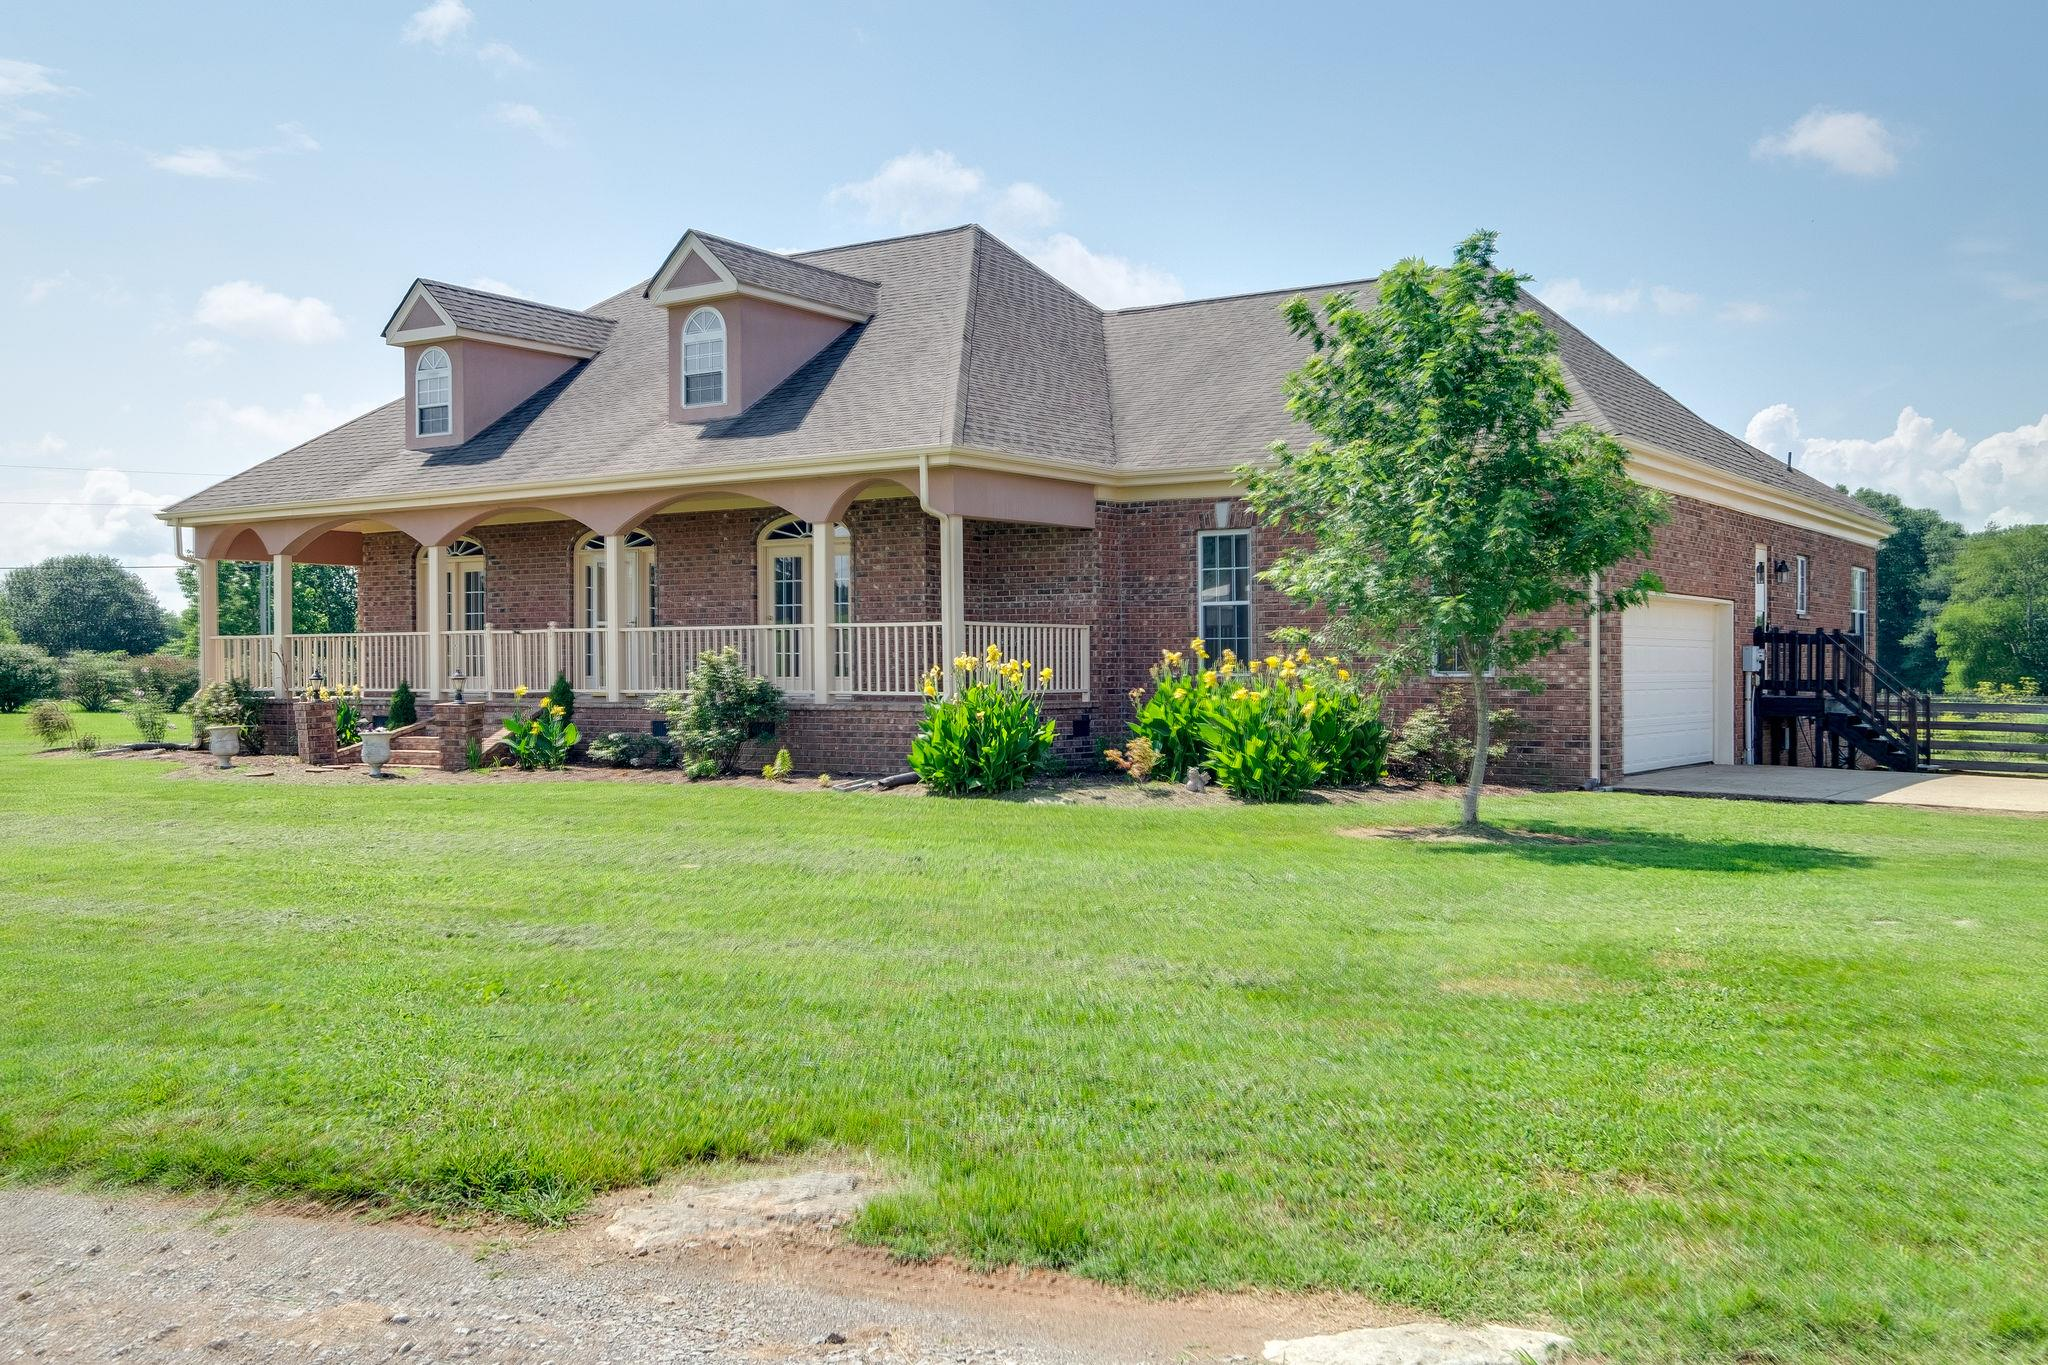 2842 Vesta Rd, Lebanon, TN 37090 - Lebanon, TN real estate listing